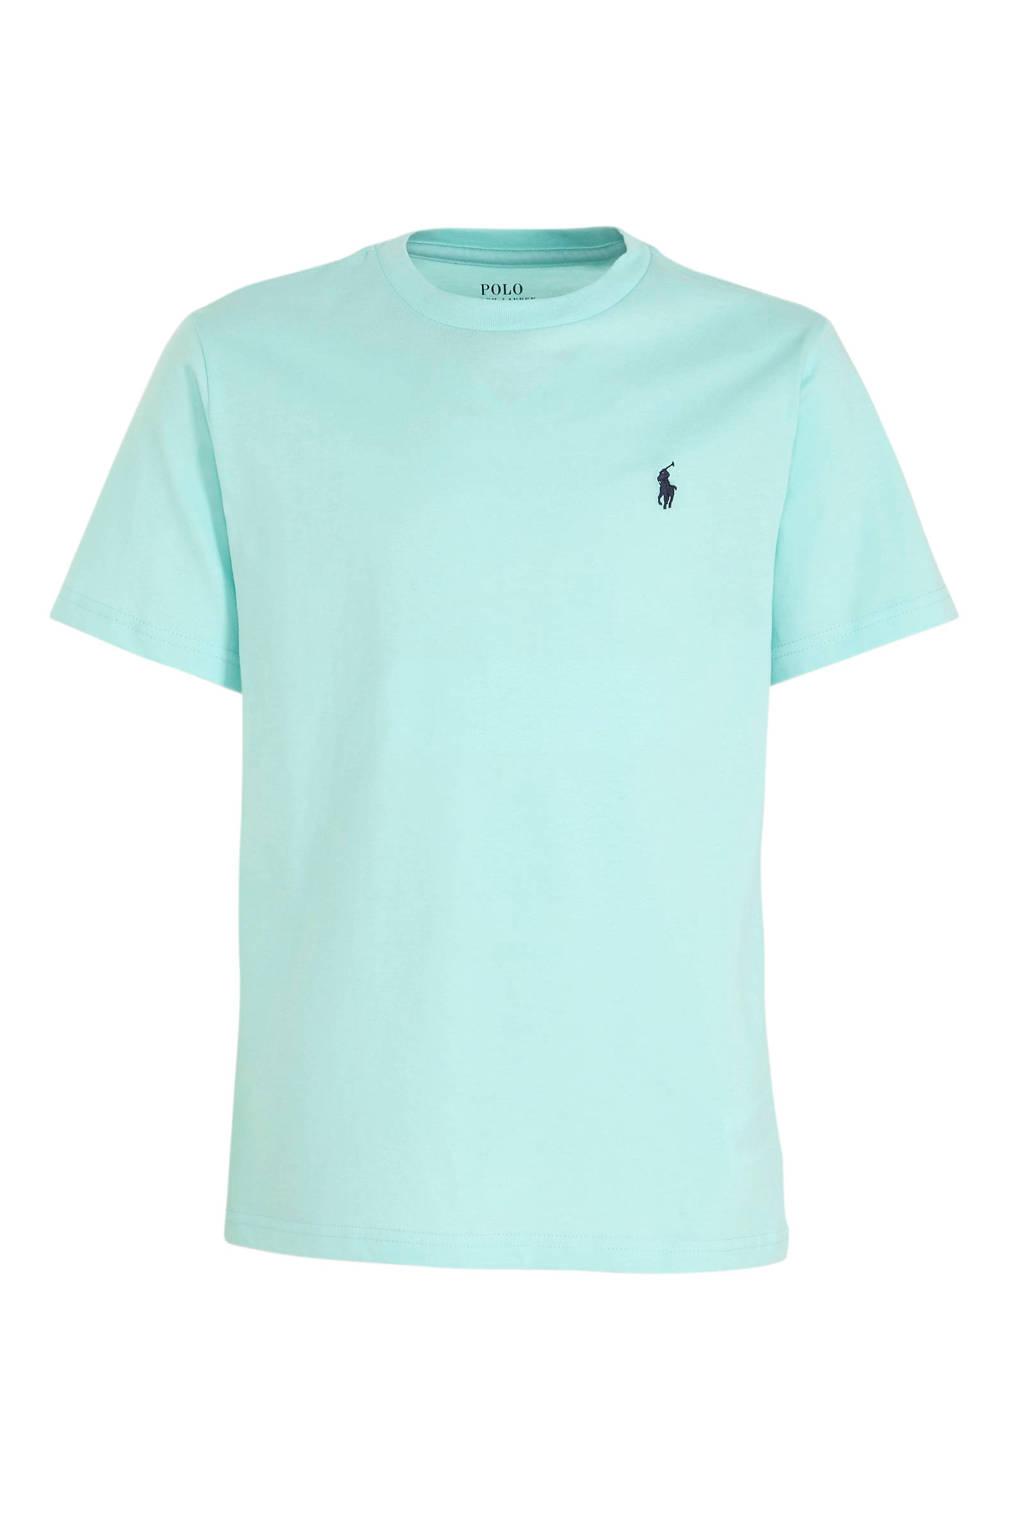 POLO Ralph Lauren T-shirt met logoborduursel mintgroen, Mintgroen